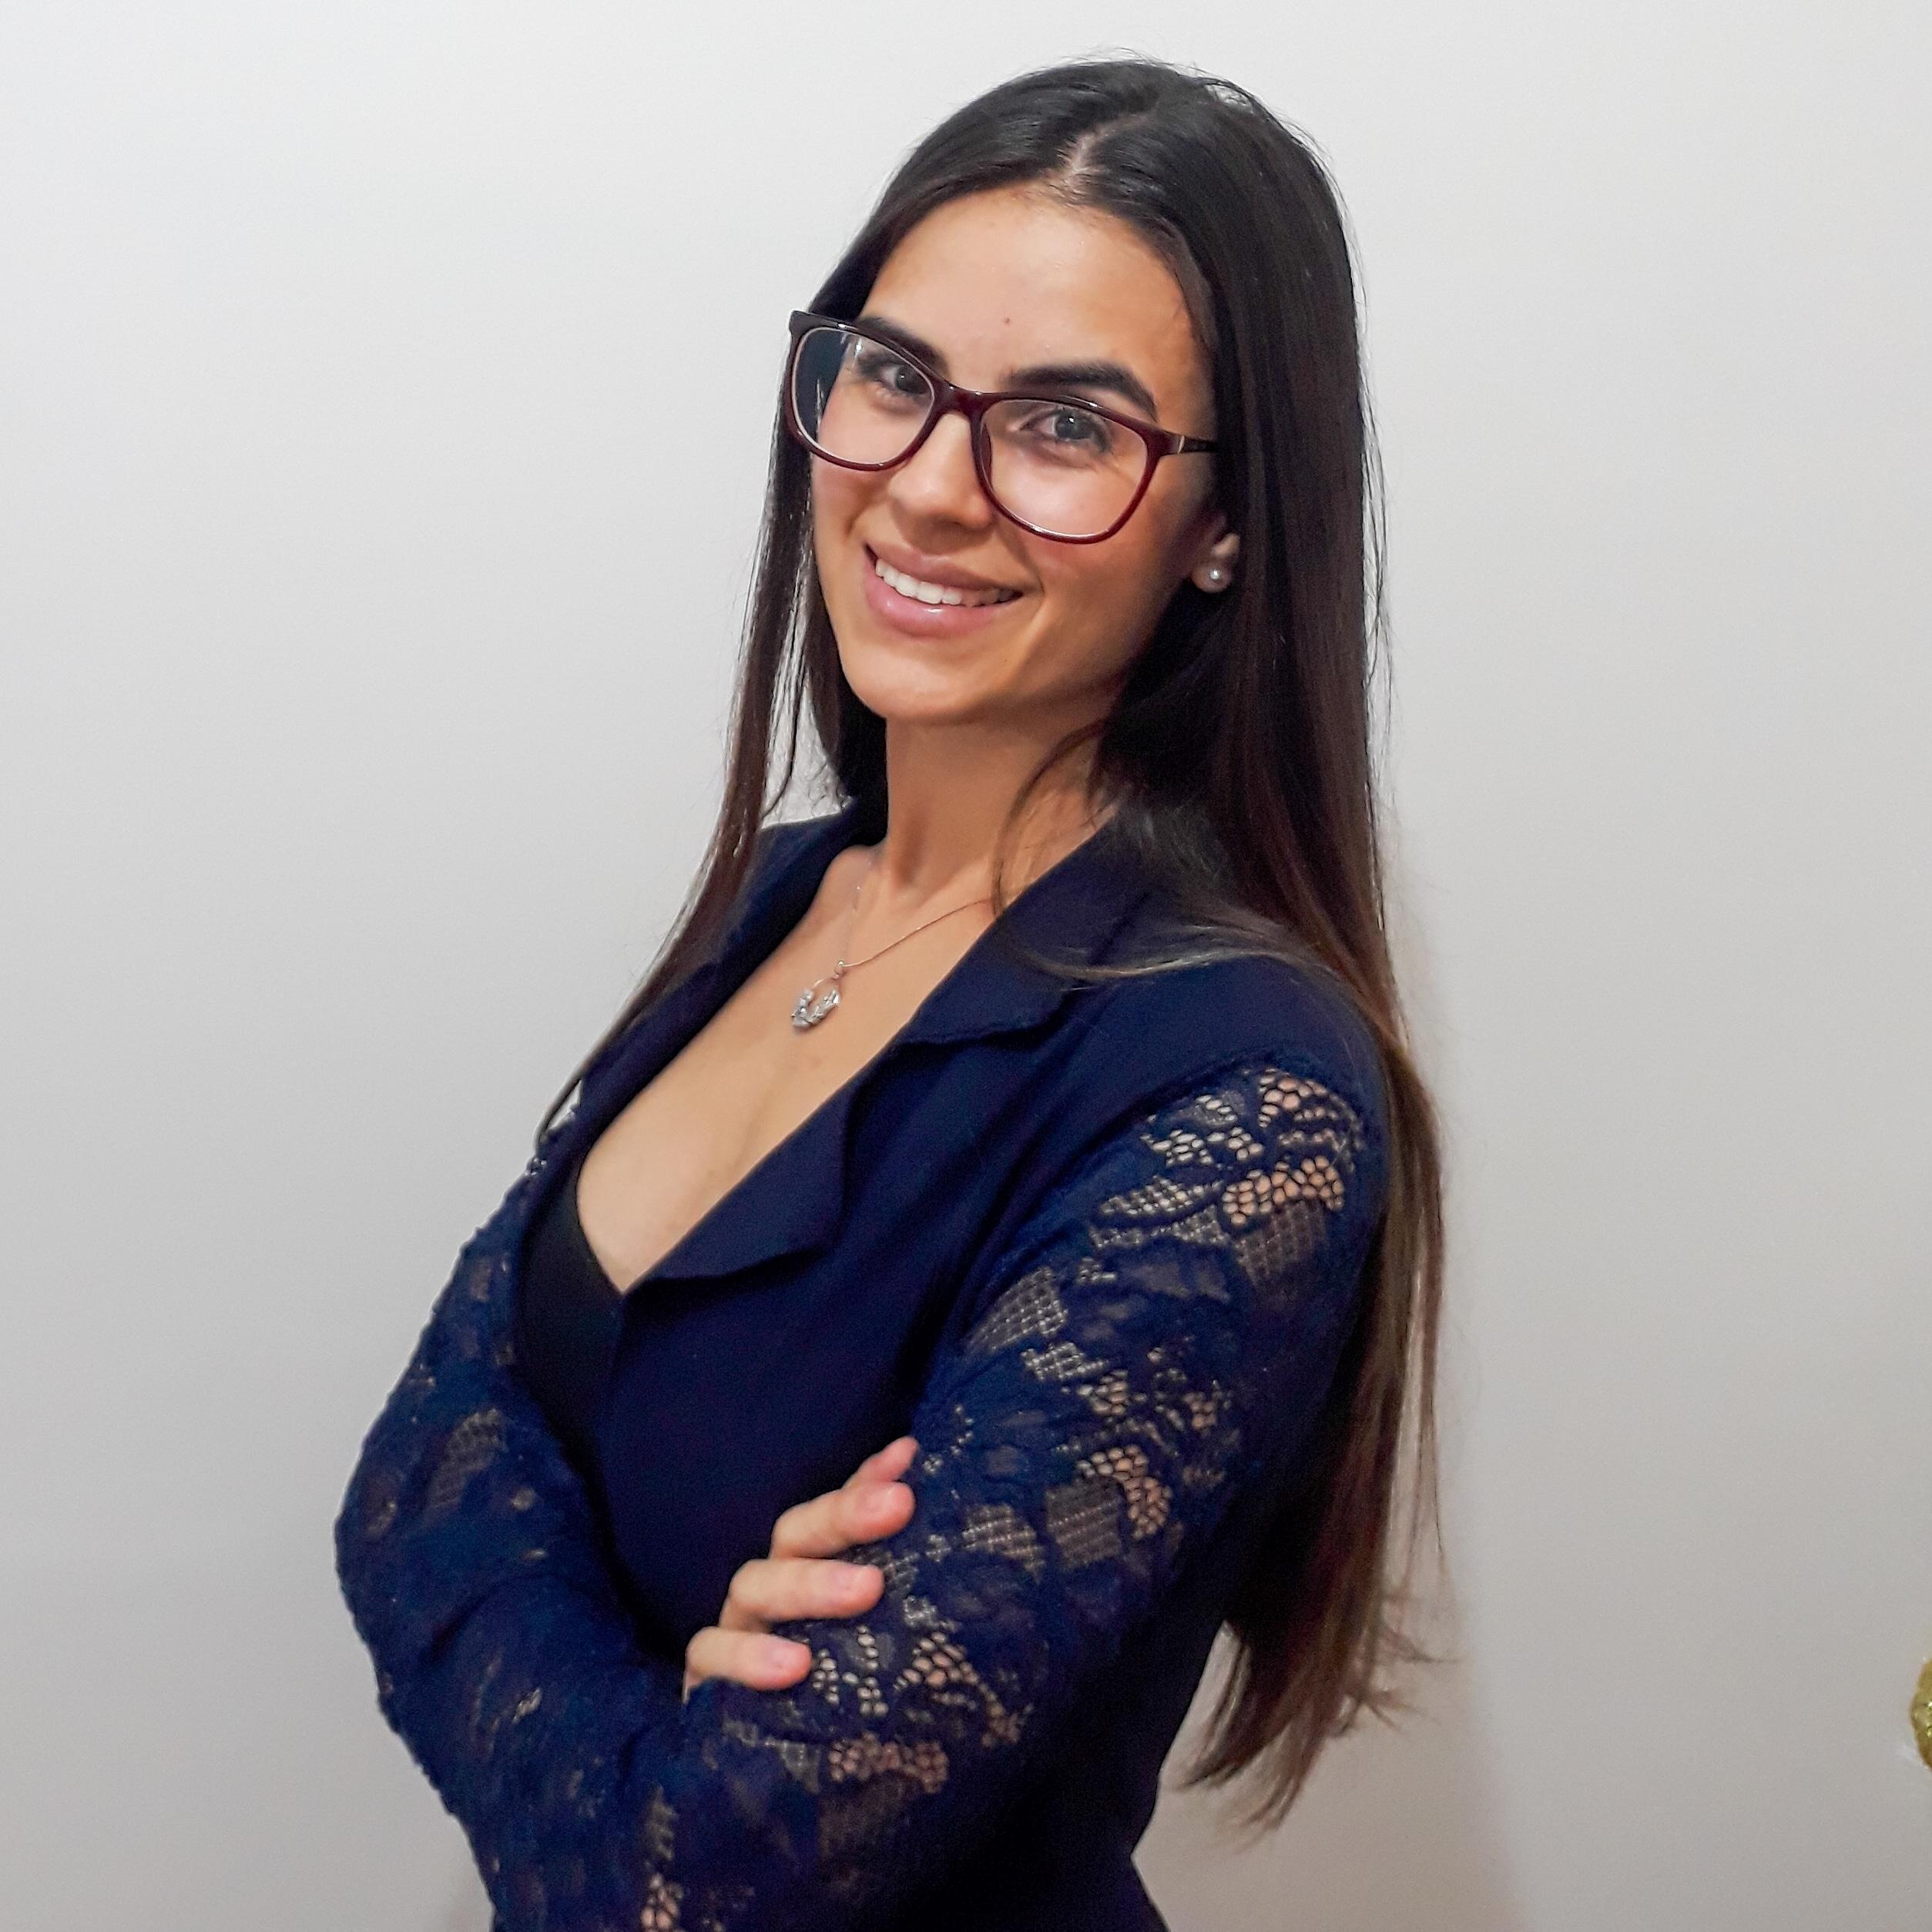 Anna Celia dos Santos Kaminoski